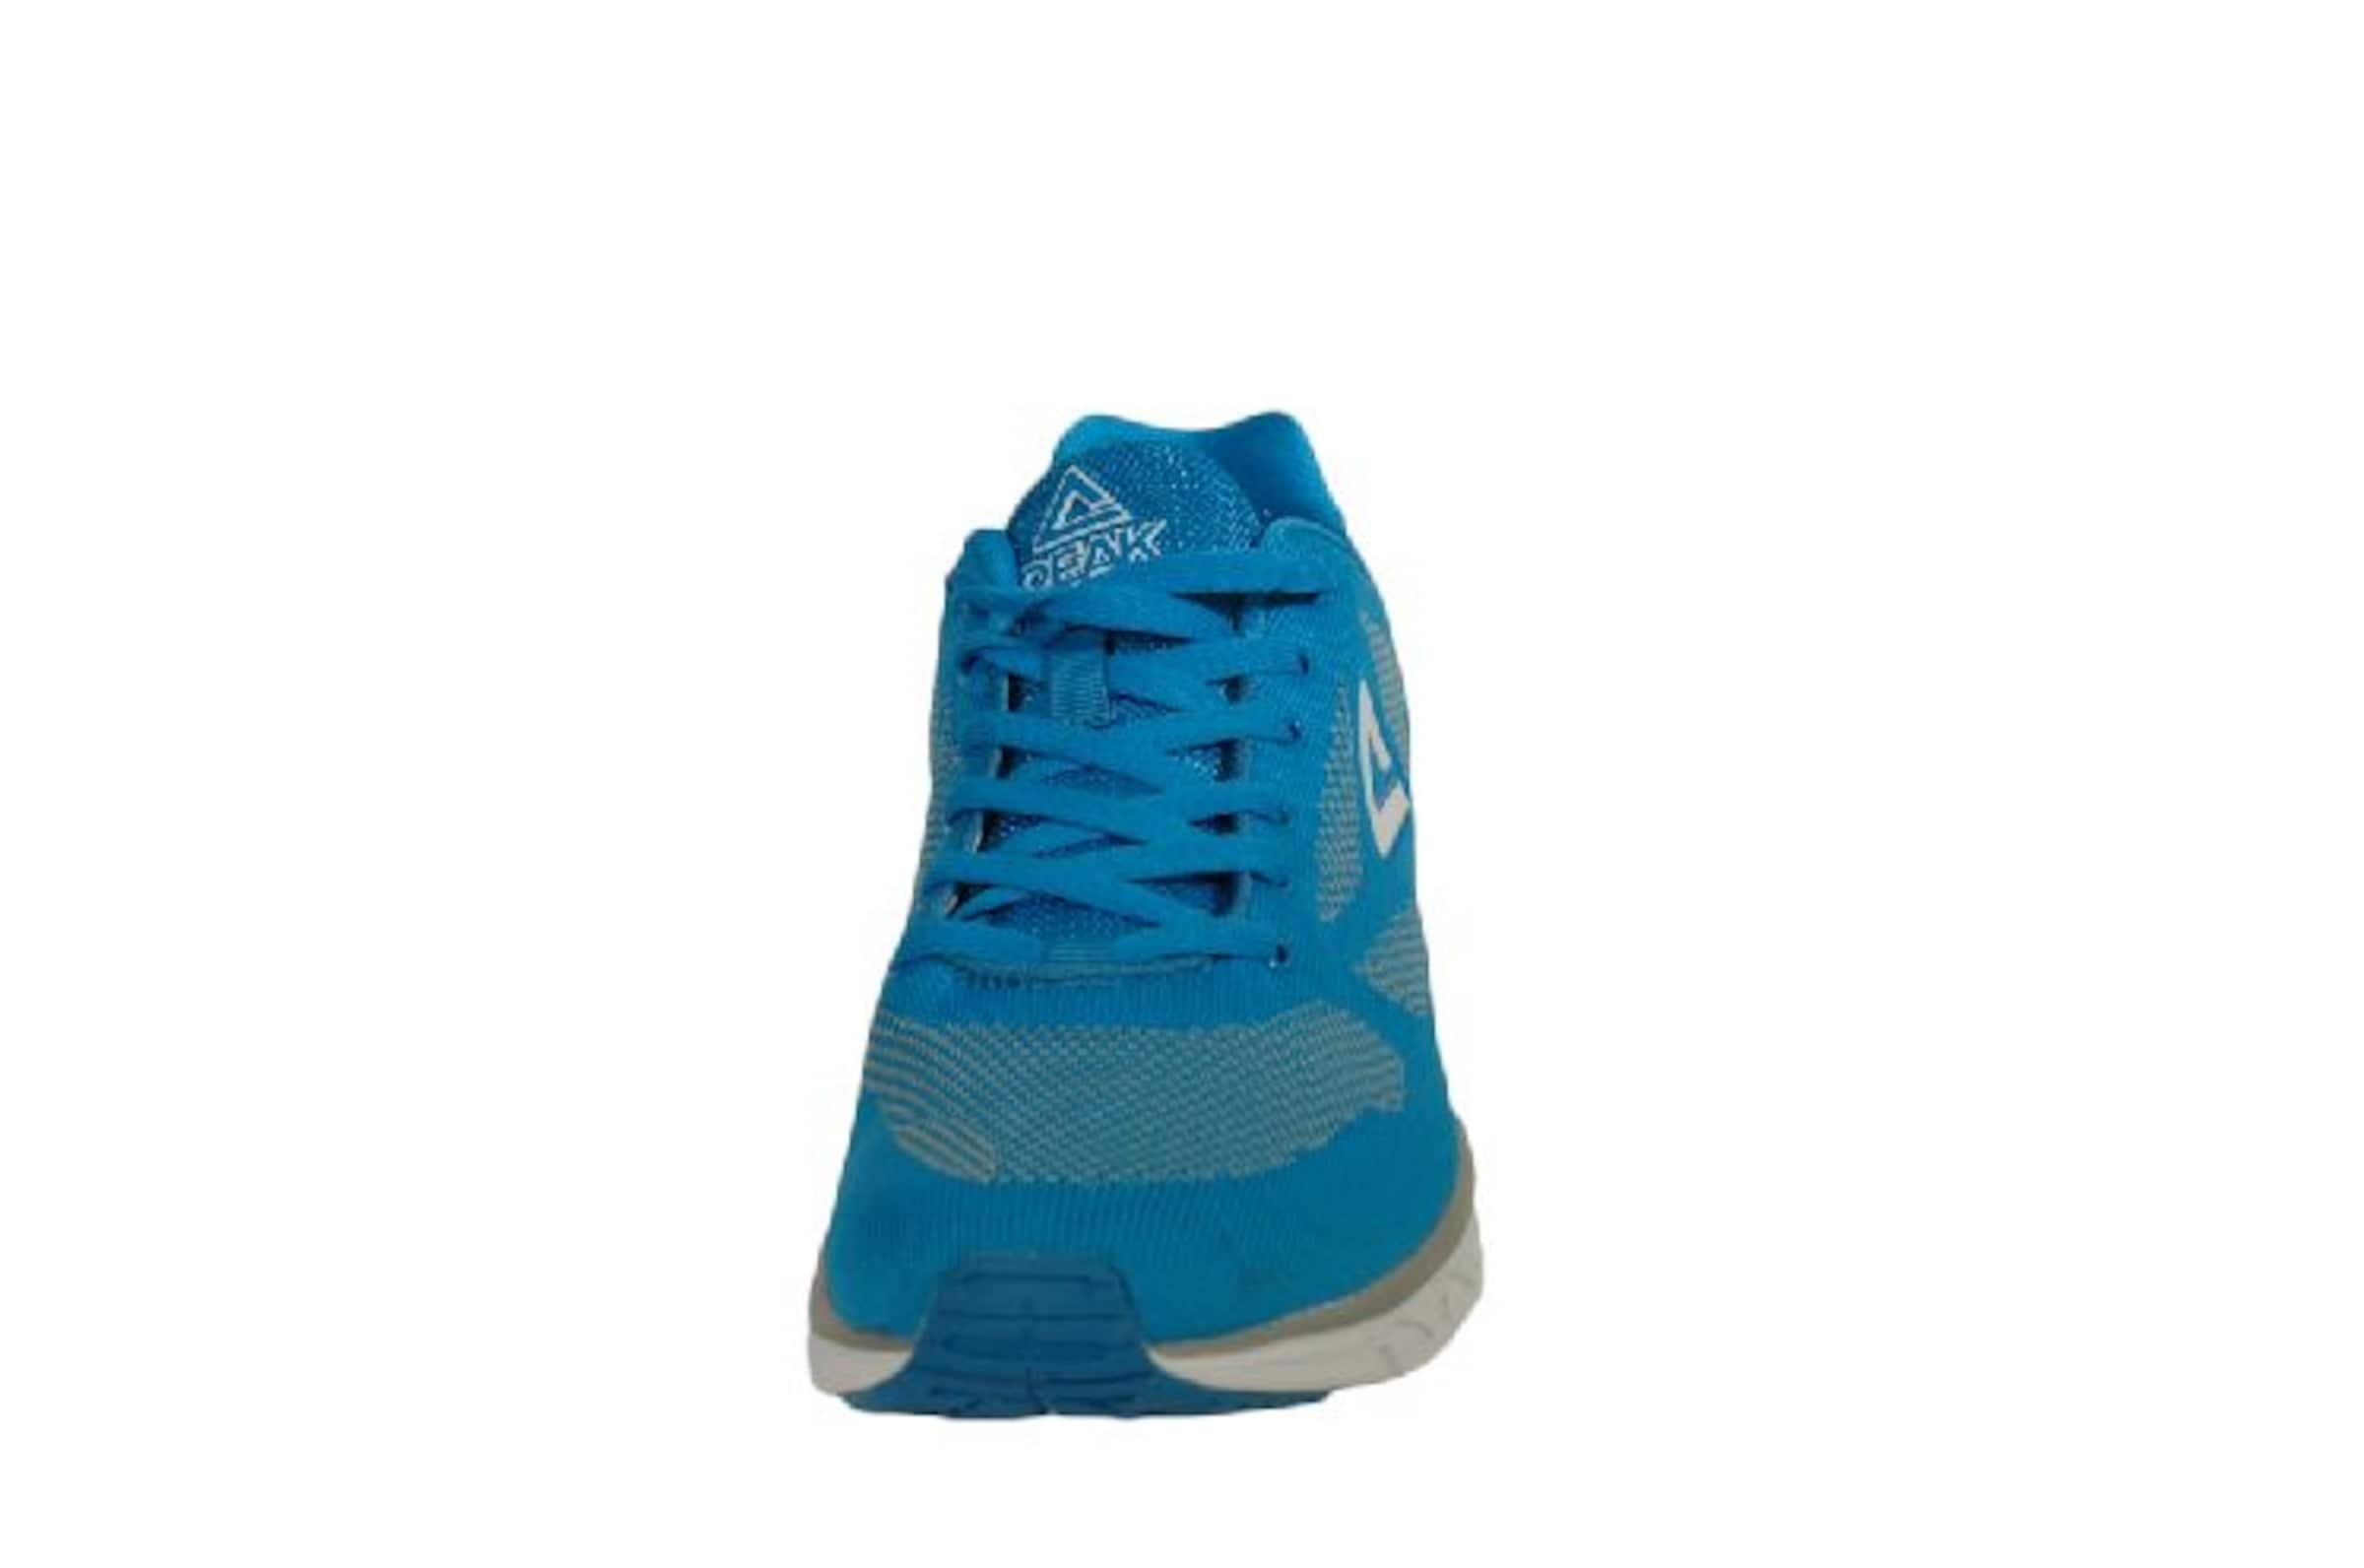 In BlauTürkis Peak Sneaker Ii' 'h2 Rider xWBQrdoeC